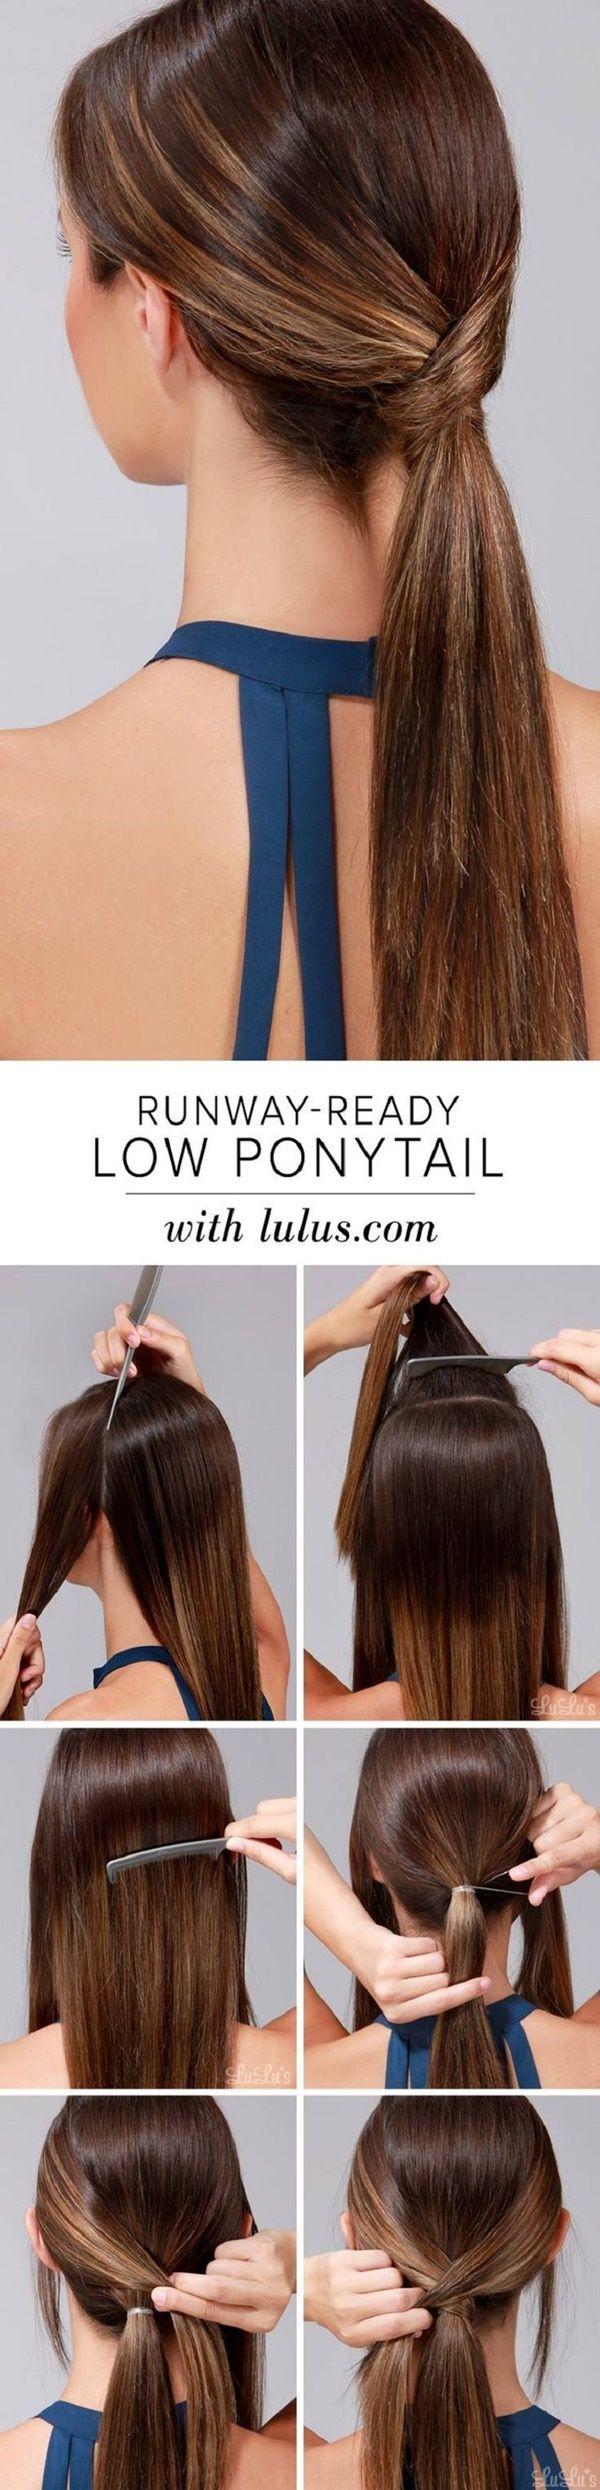 Tremendous 1000 Ideas About Easy School Hairstyles On Pinterest School Hairstyles For Women Draintrainus